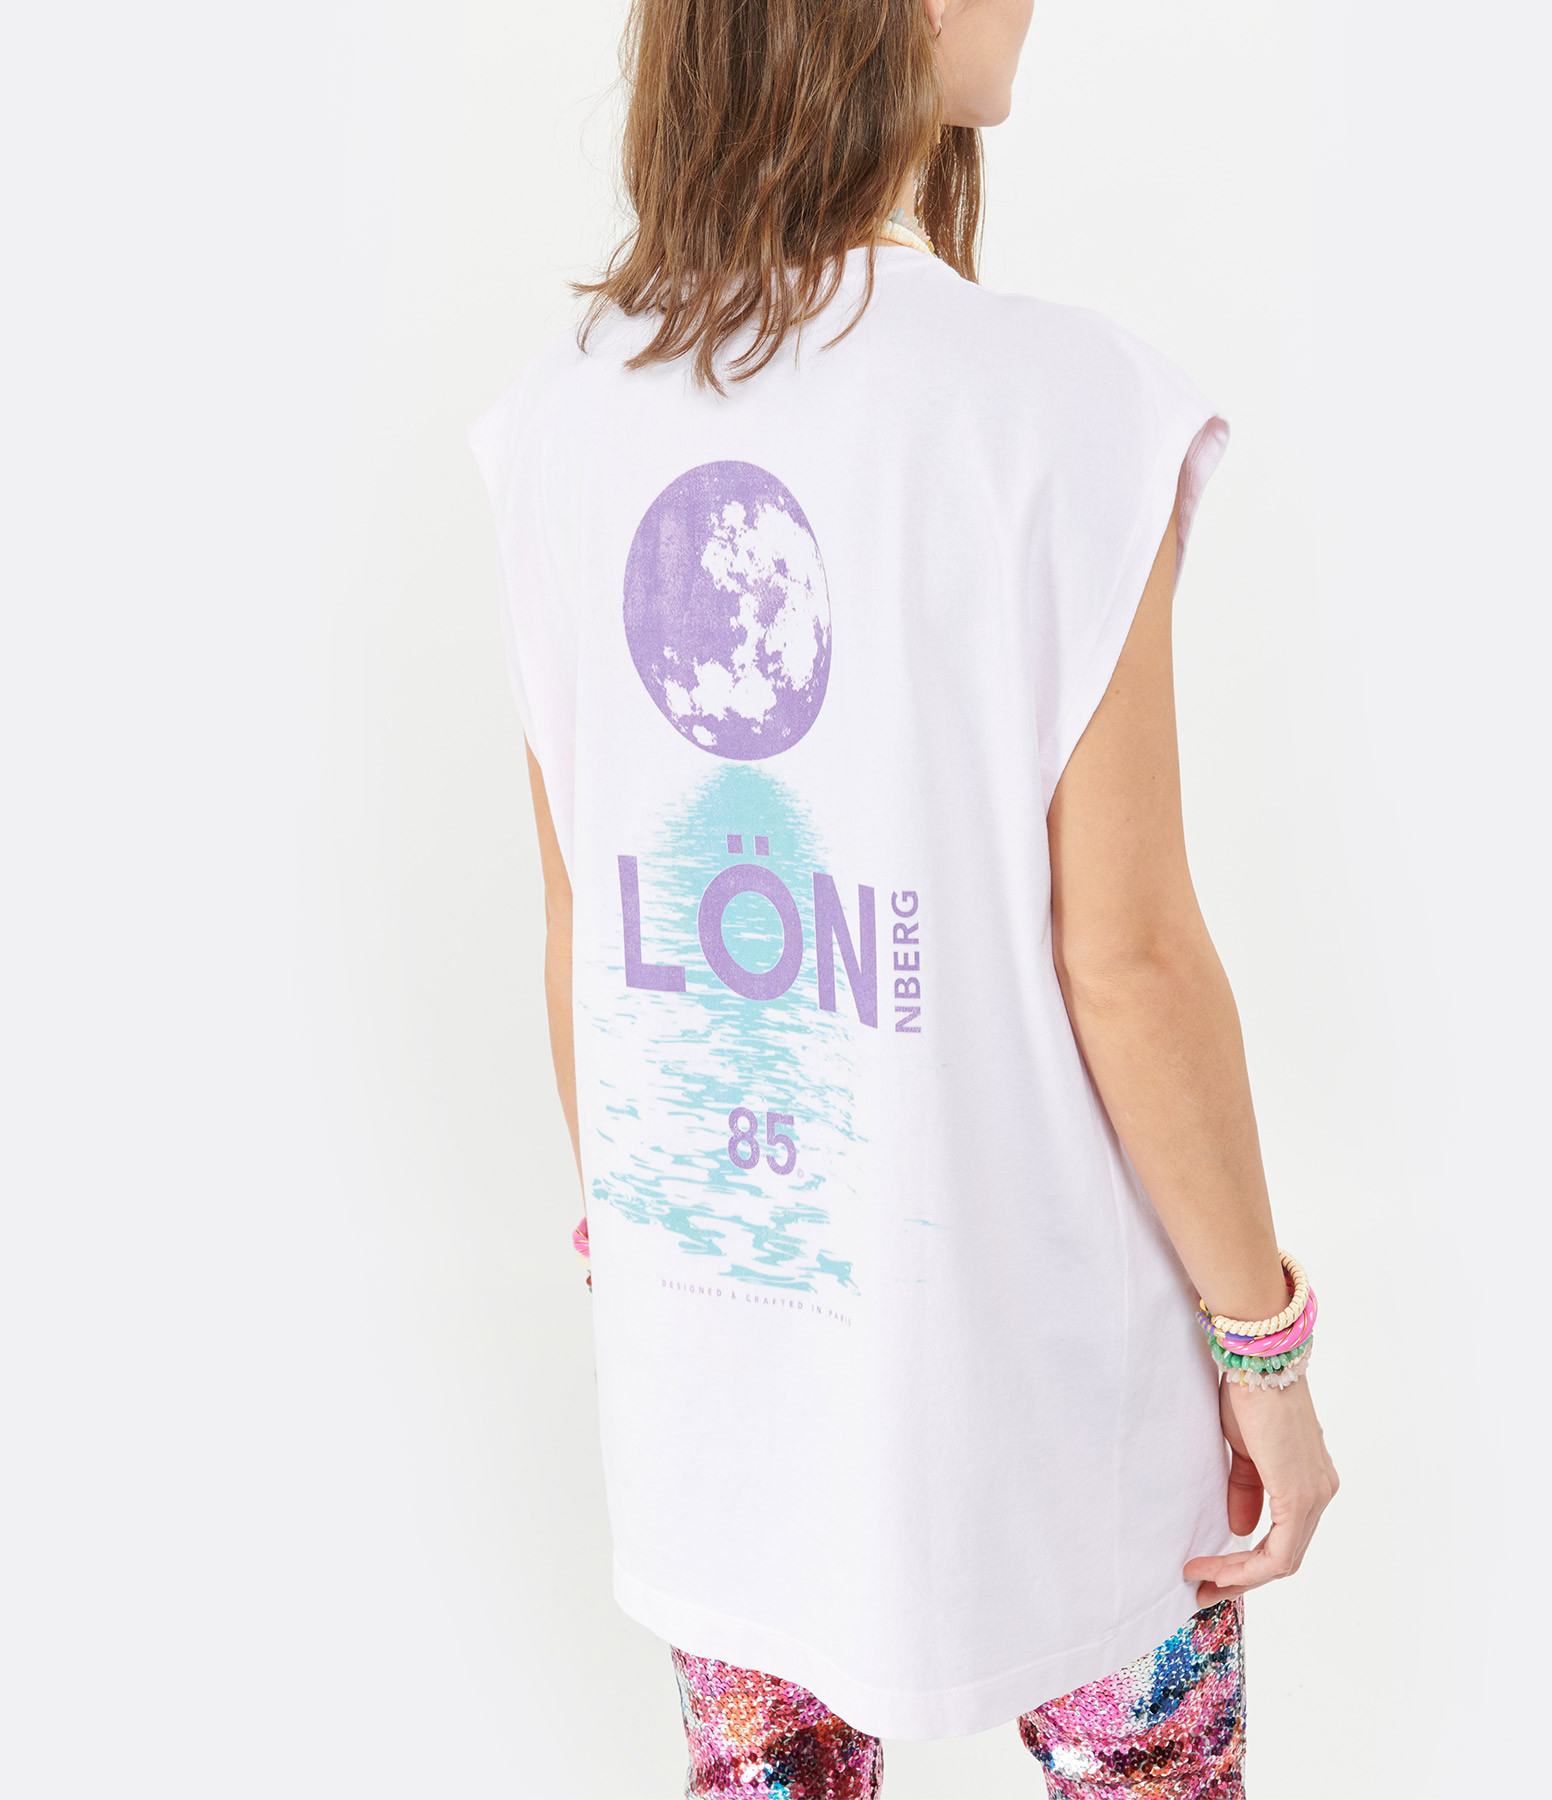 MARGAUX LONNBERG - Tee-shirt Rio Imprimé Rose